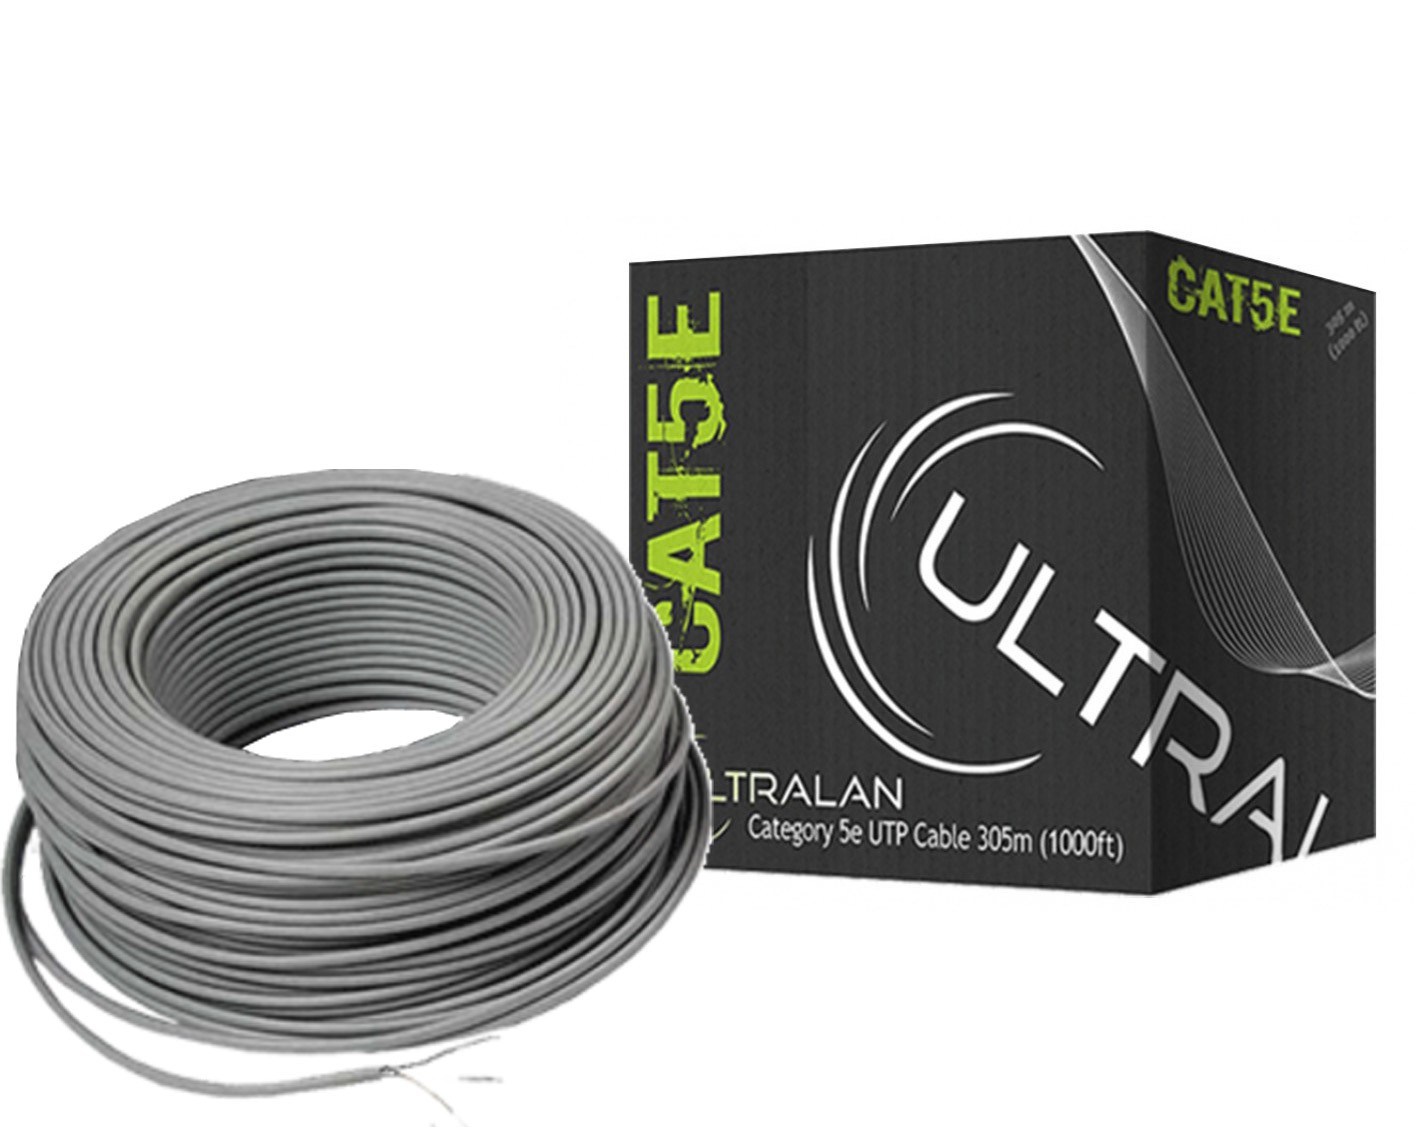 Ultralan Lan Ethernet Cable Cat5e Solid Utp 305m Geewiz Cat 5e Wiring